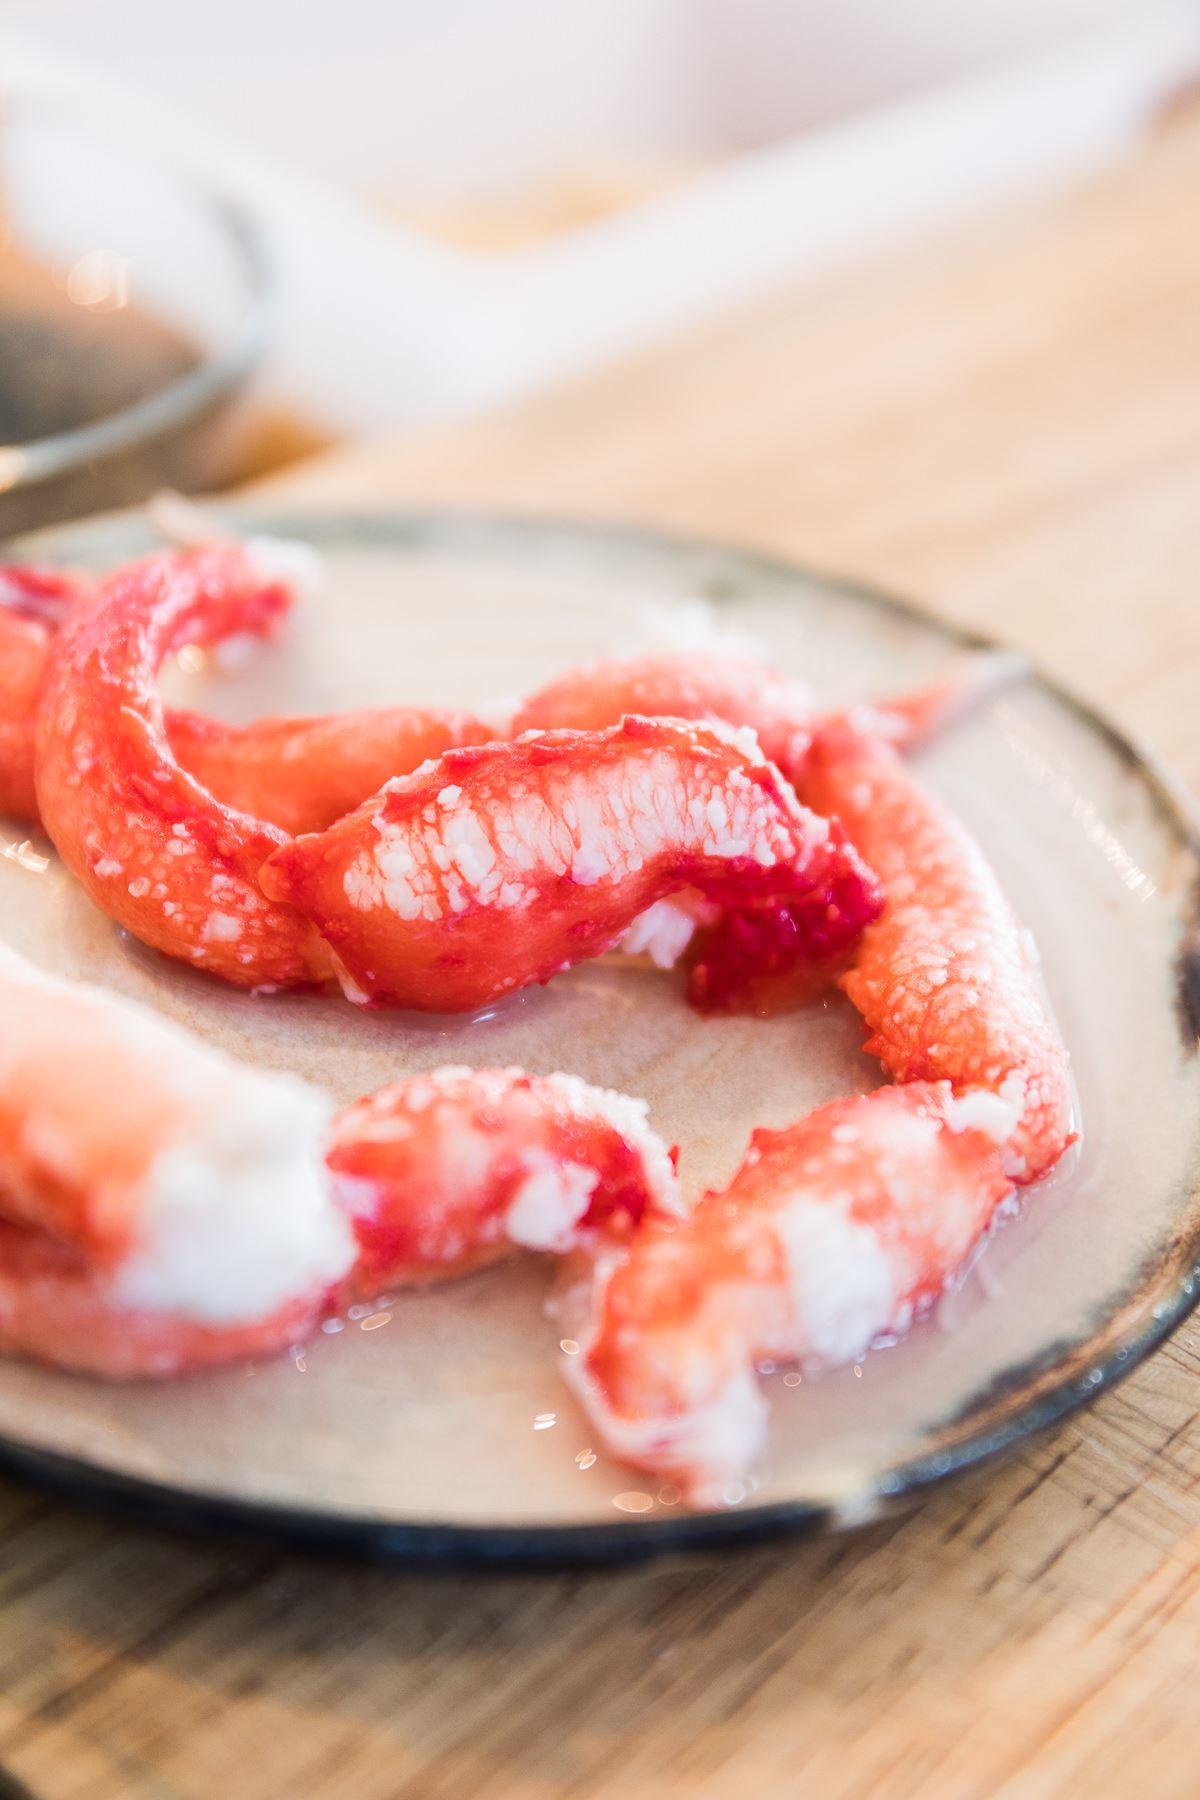 © Brice Portolano, Cooking Classes - Lofoten Food Studio